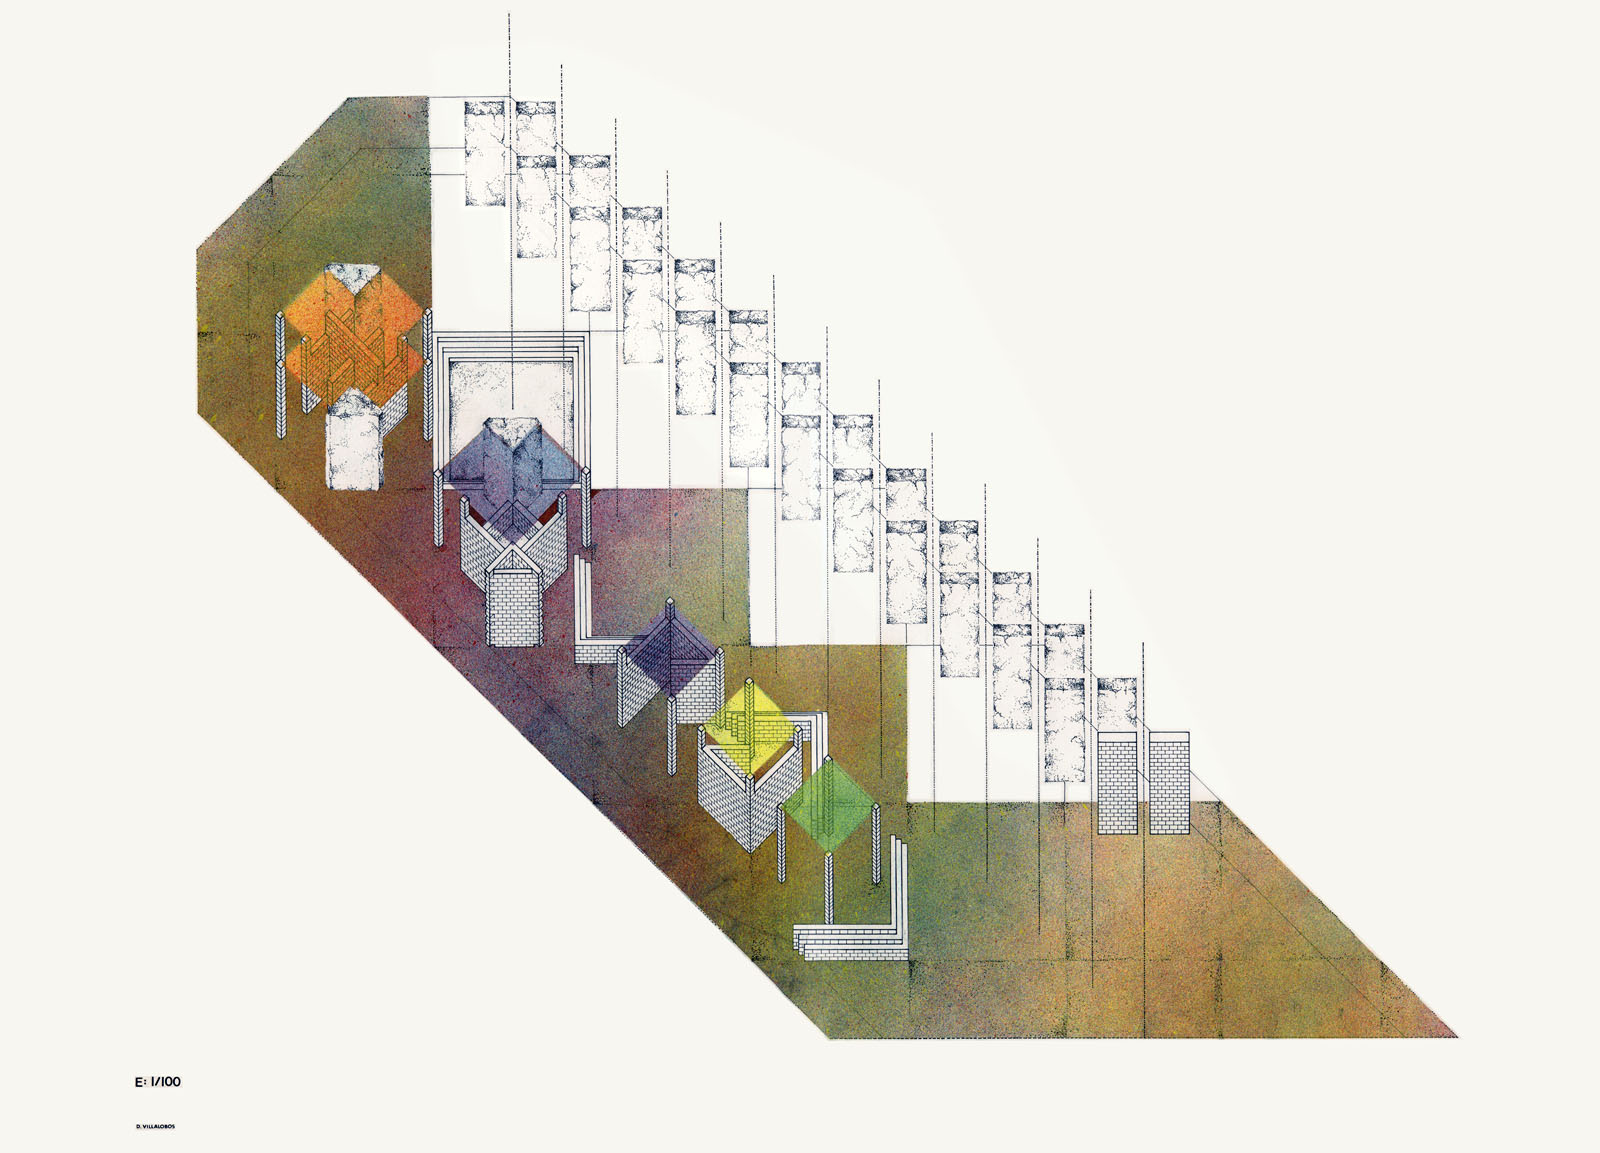 danielvillalobos-architecturexxthcentury-spanisharchitecture-schoolarchitectureproject-3